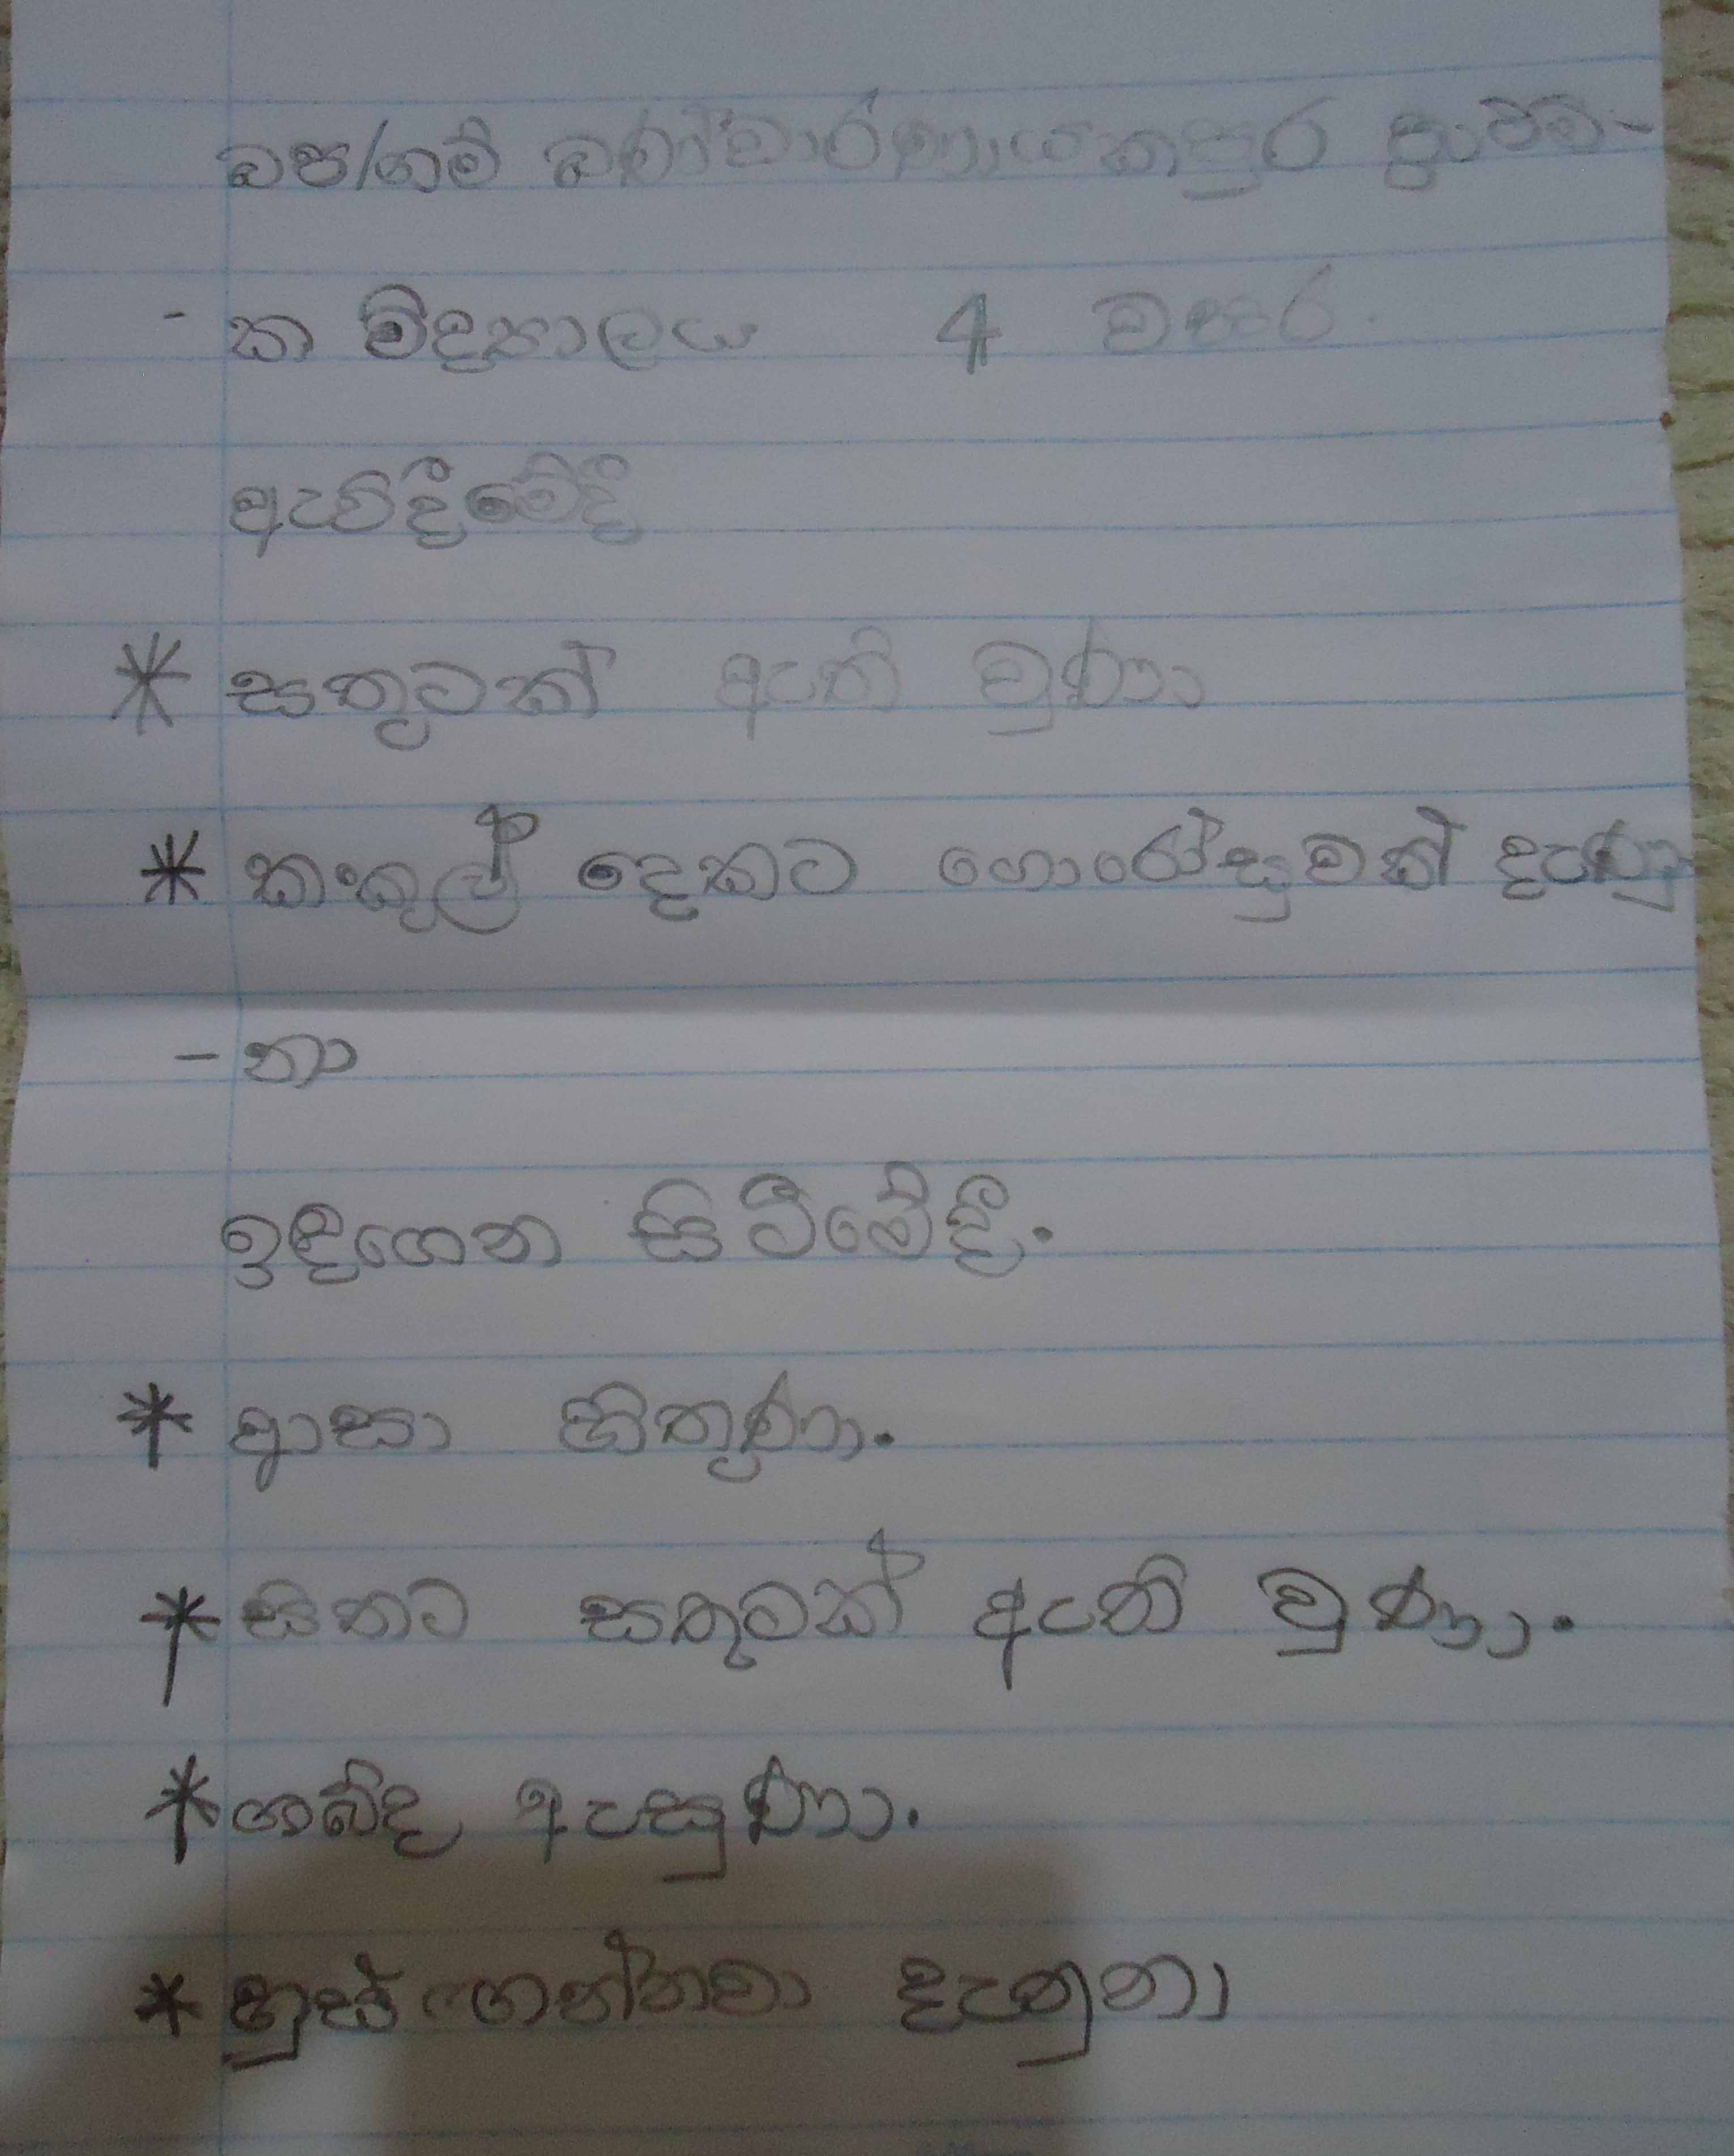 Feedback from students-WP GM Bandaranayakepura Primary School, Kirindiwela (1)